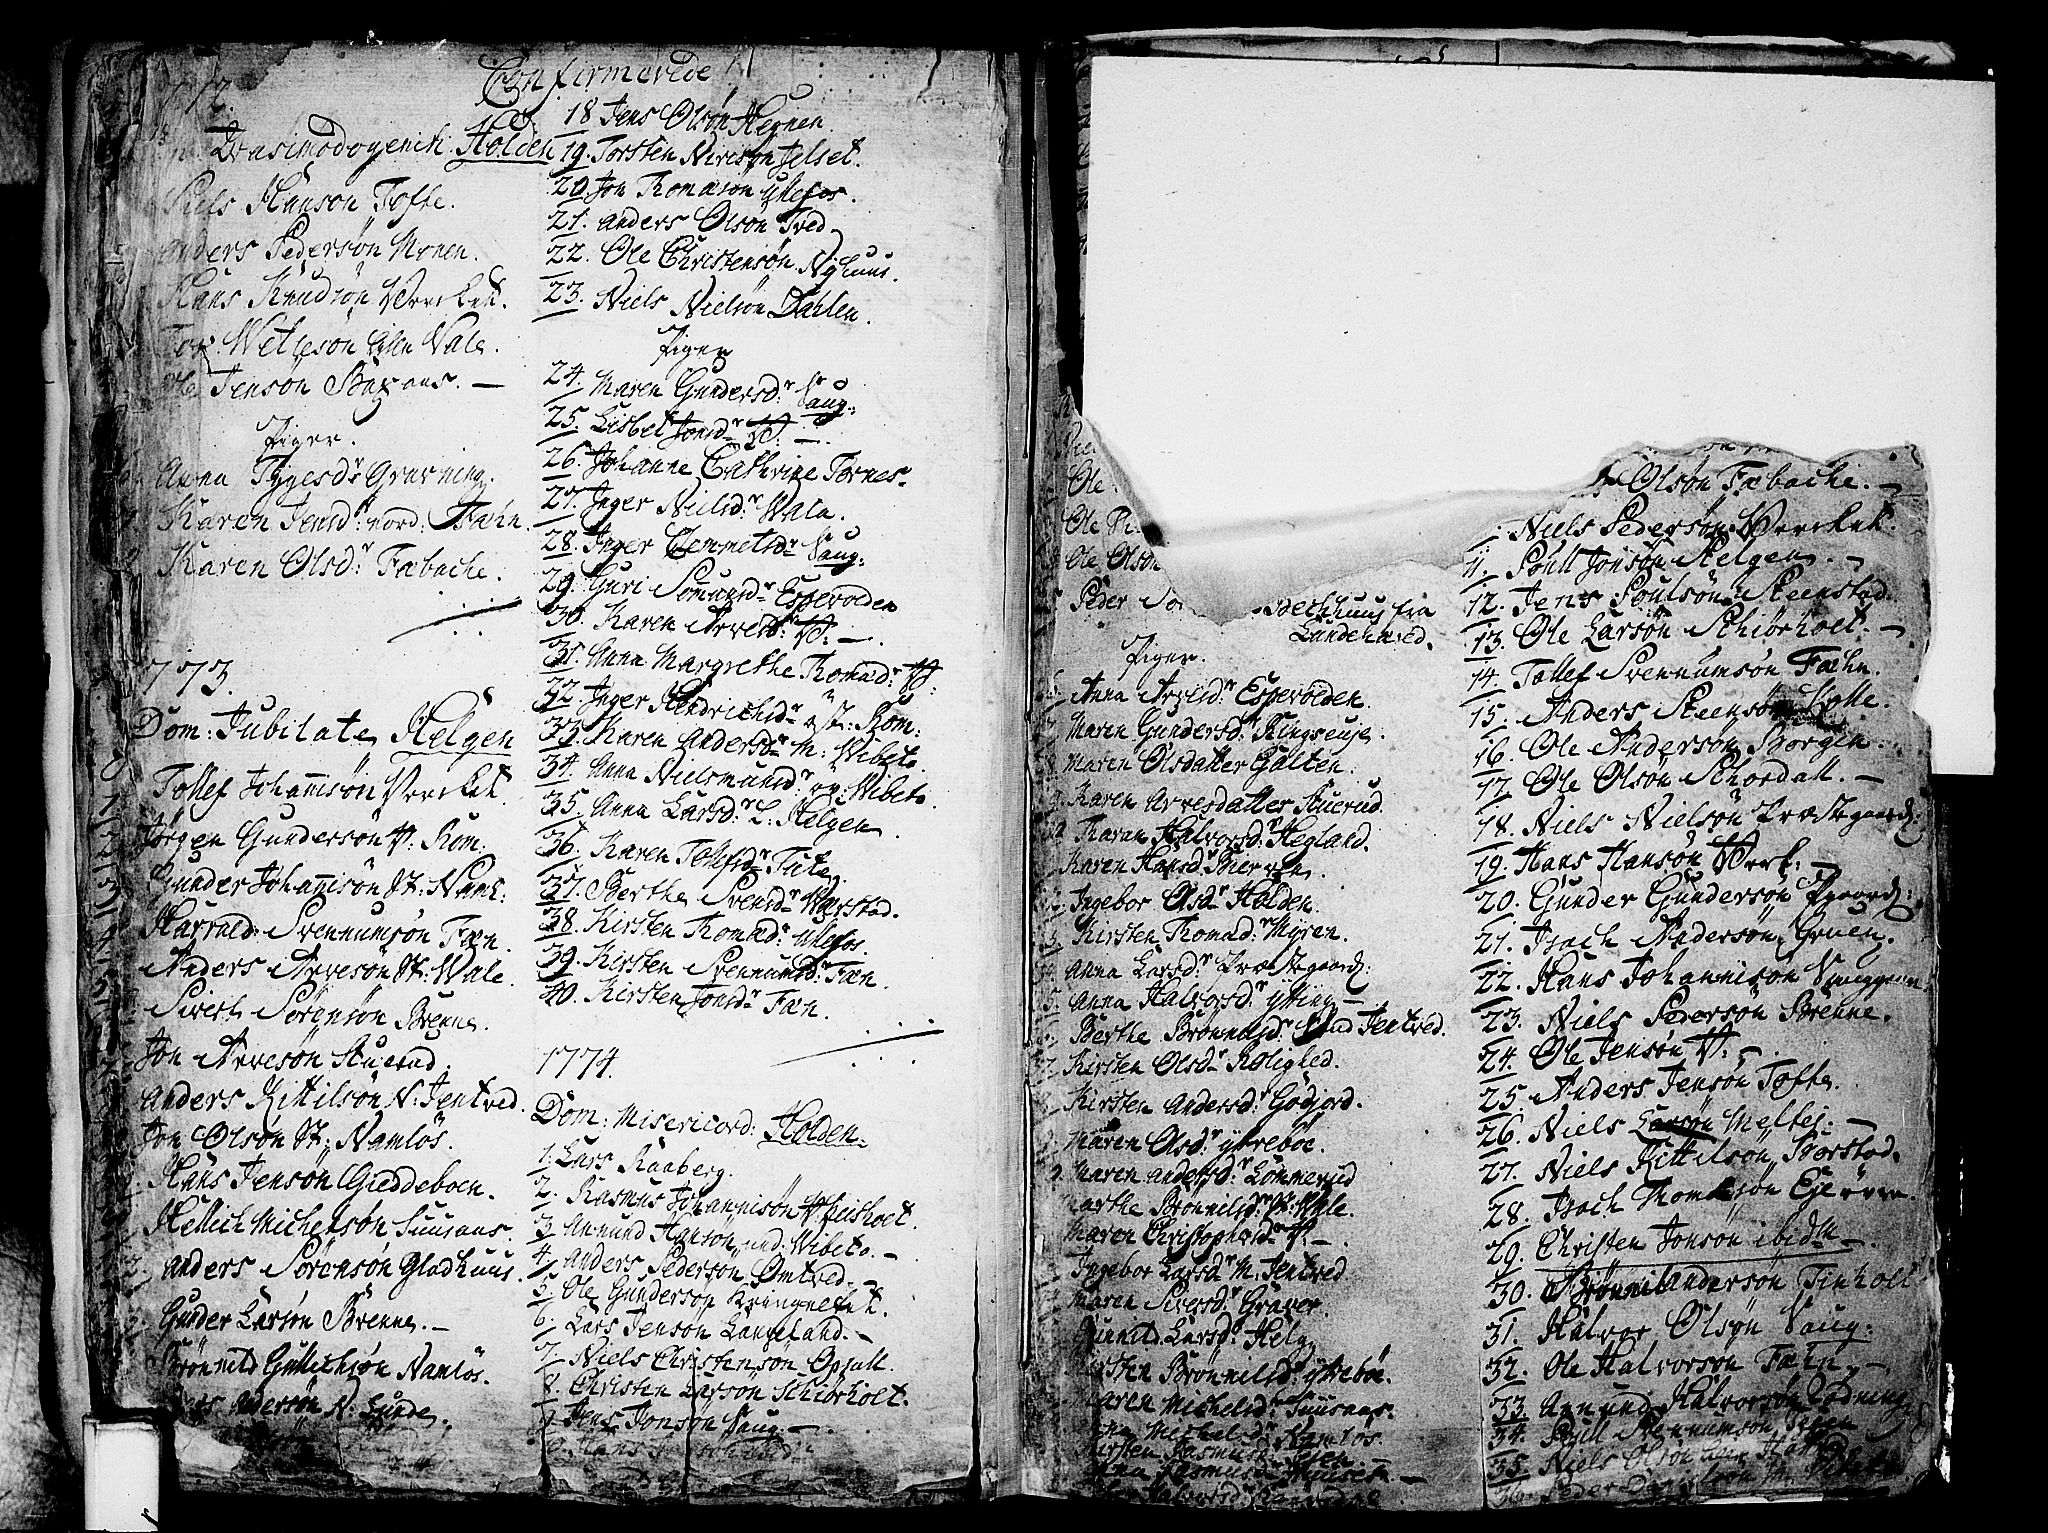 SAKO, Holla kirkebøker, F/Fa/L0001: Ministerialbok nr. 1, 1717-1779, s. 274